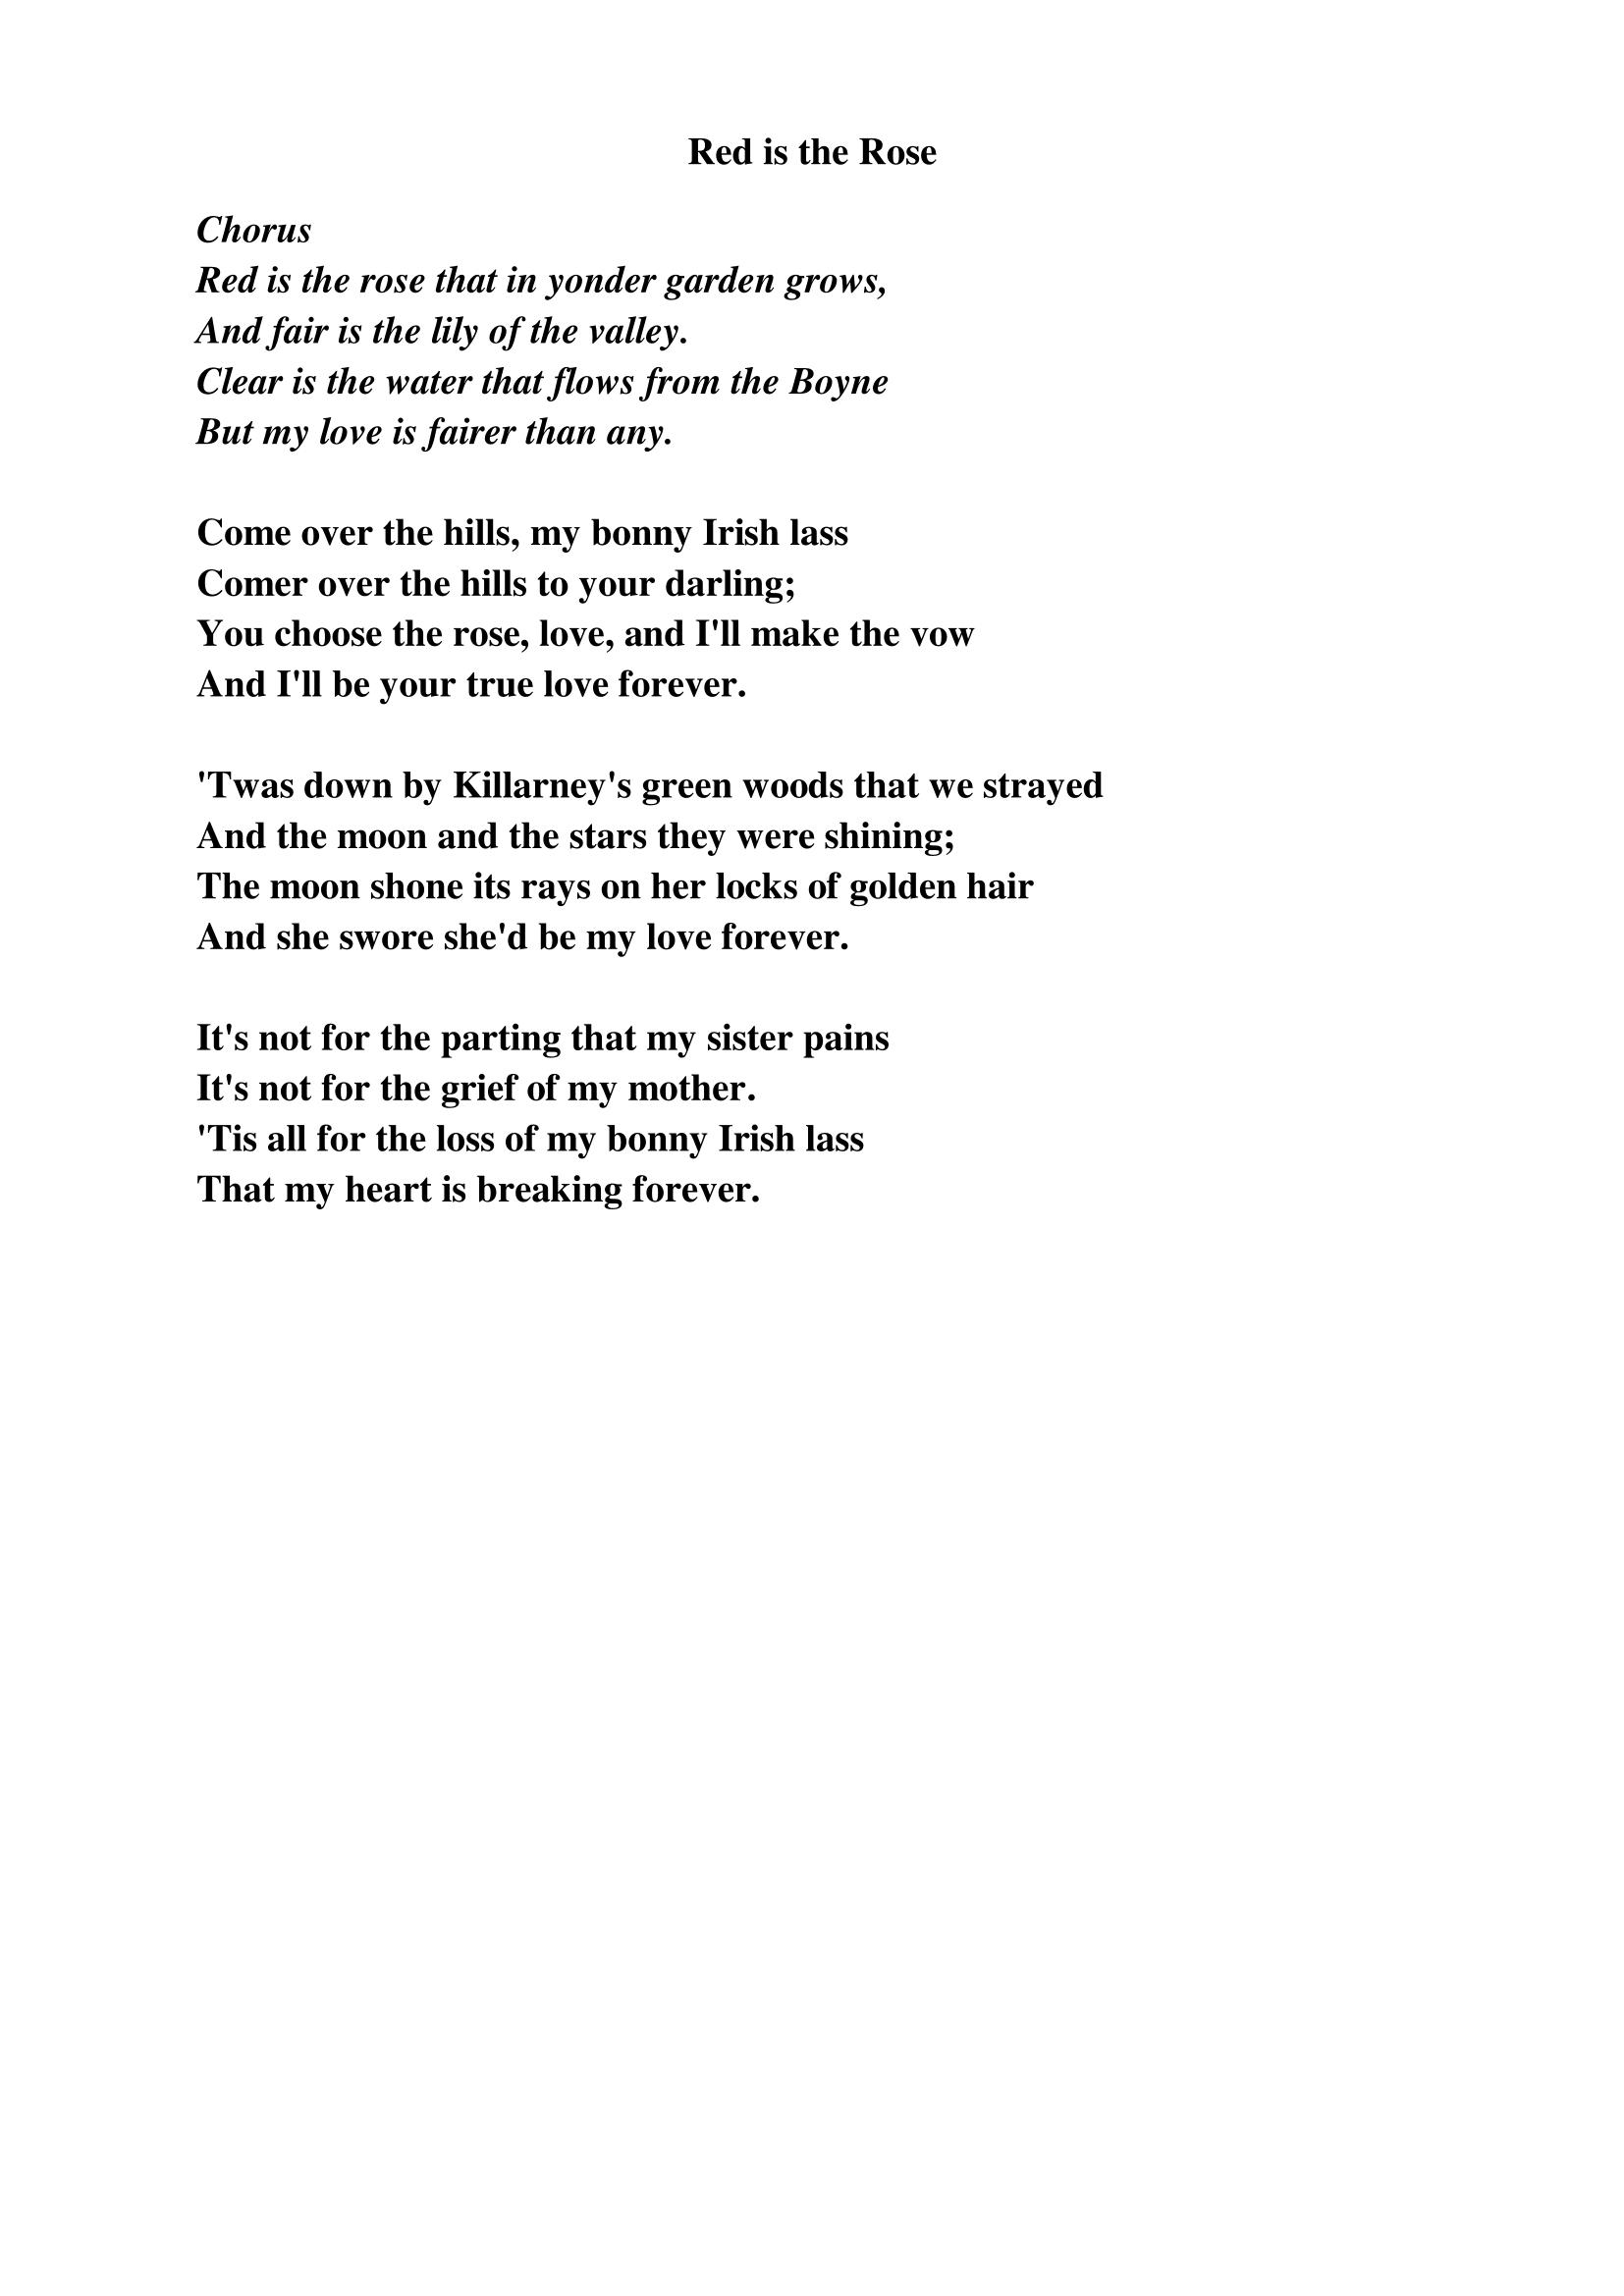 Red is the Rose lyrics – getcrackingguitar